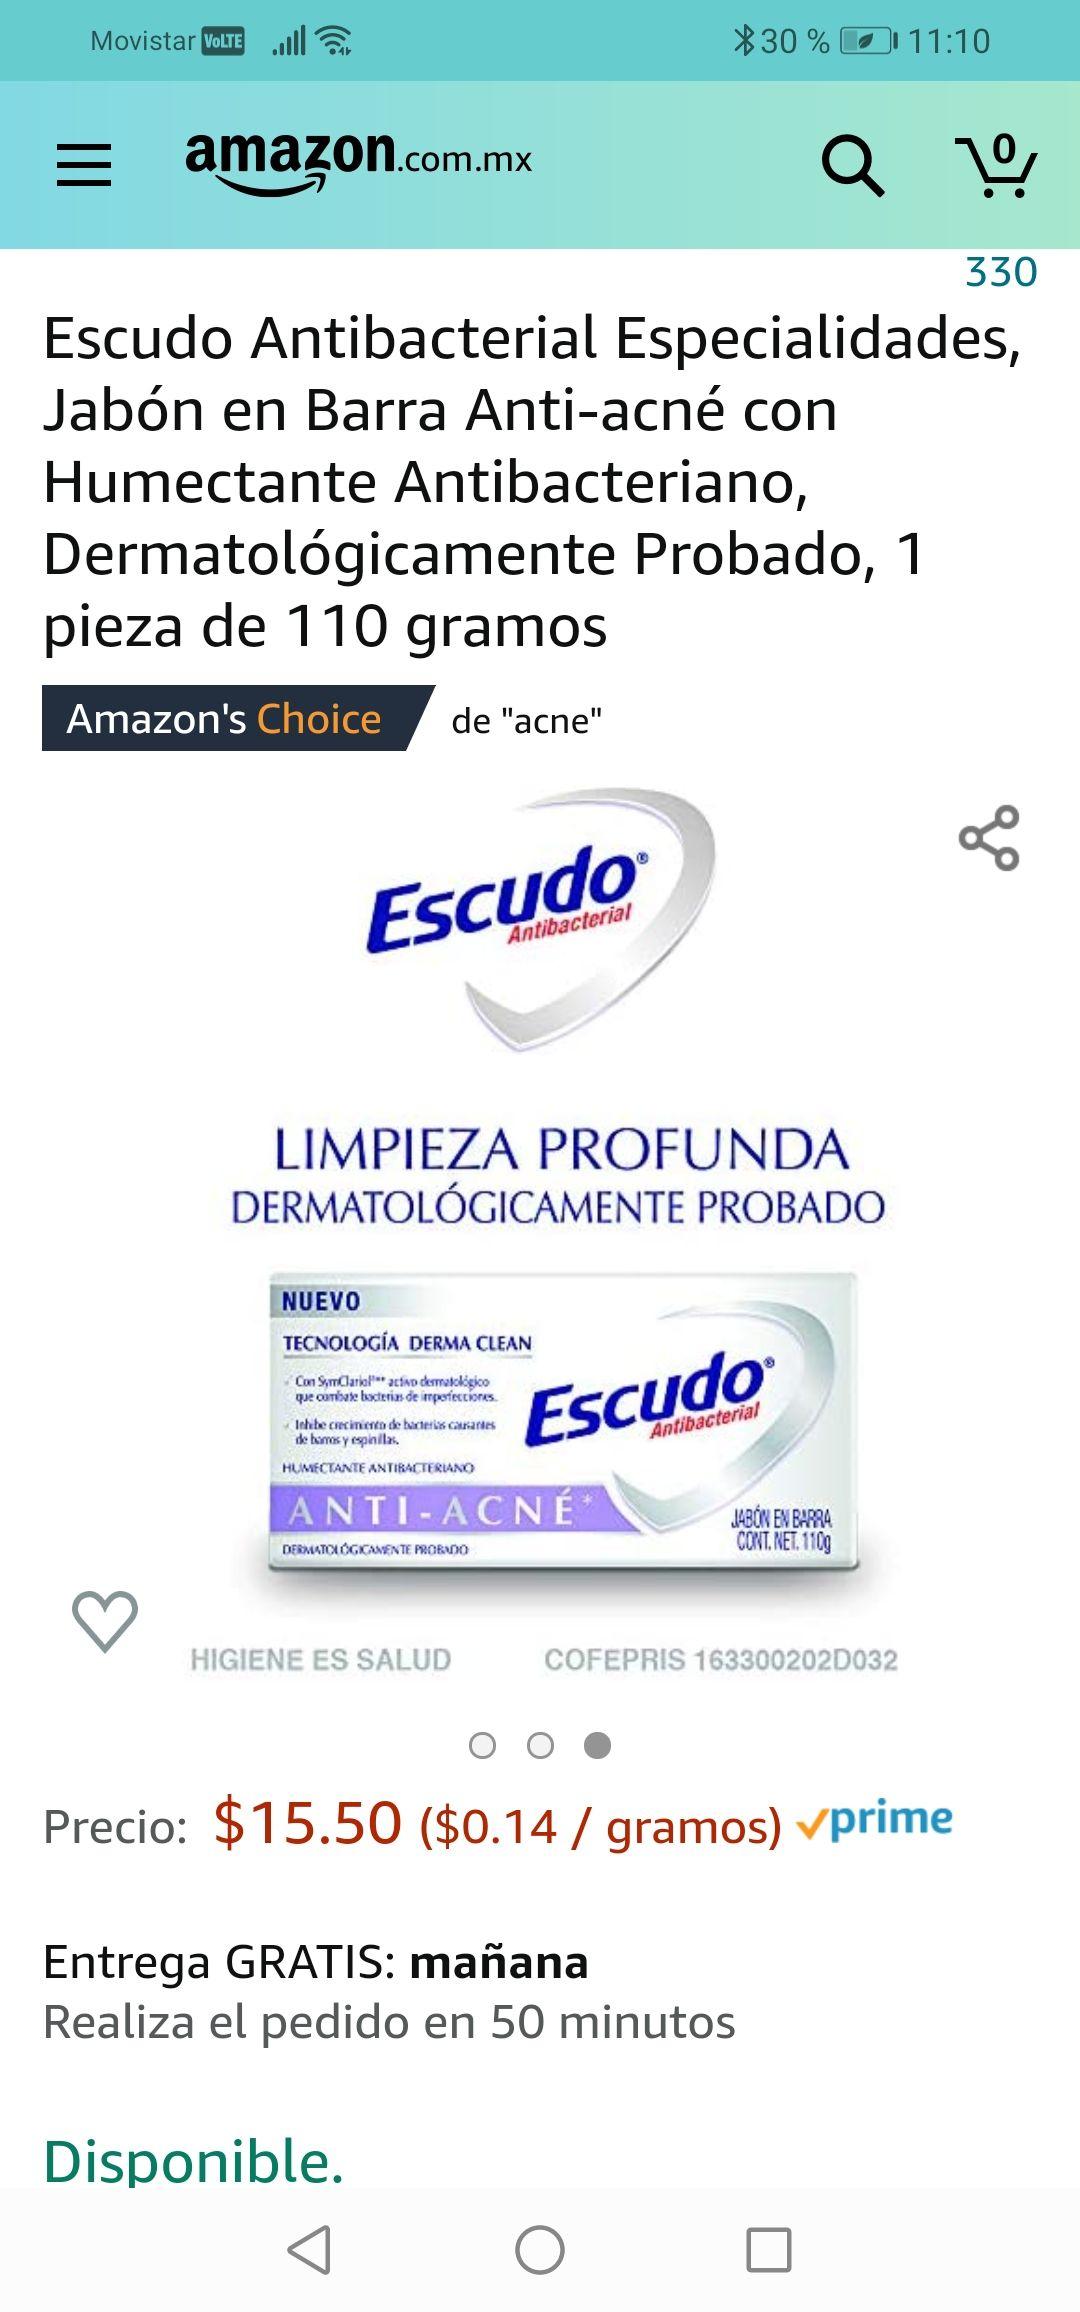 Amazon: Escudo Antibacterial Especialidades, Jabón en Barra Anti-acné con Humectante Antibacteriano